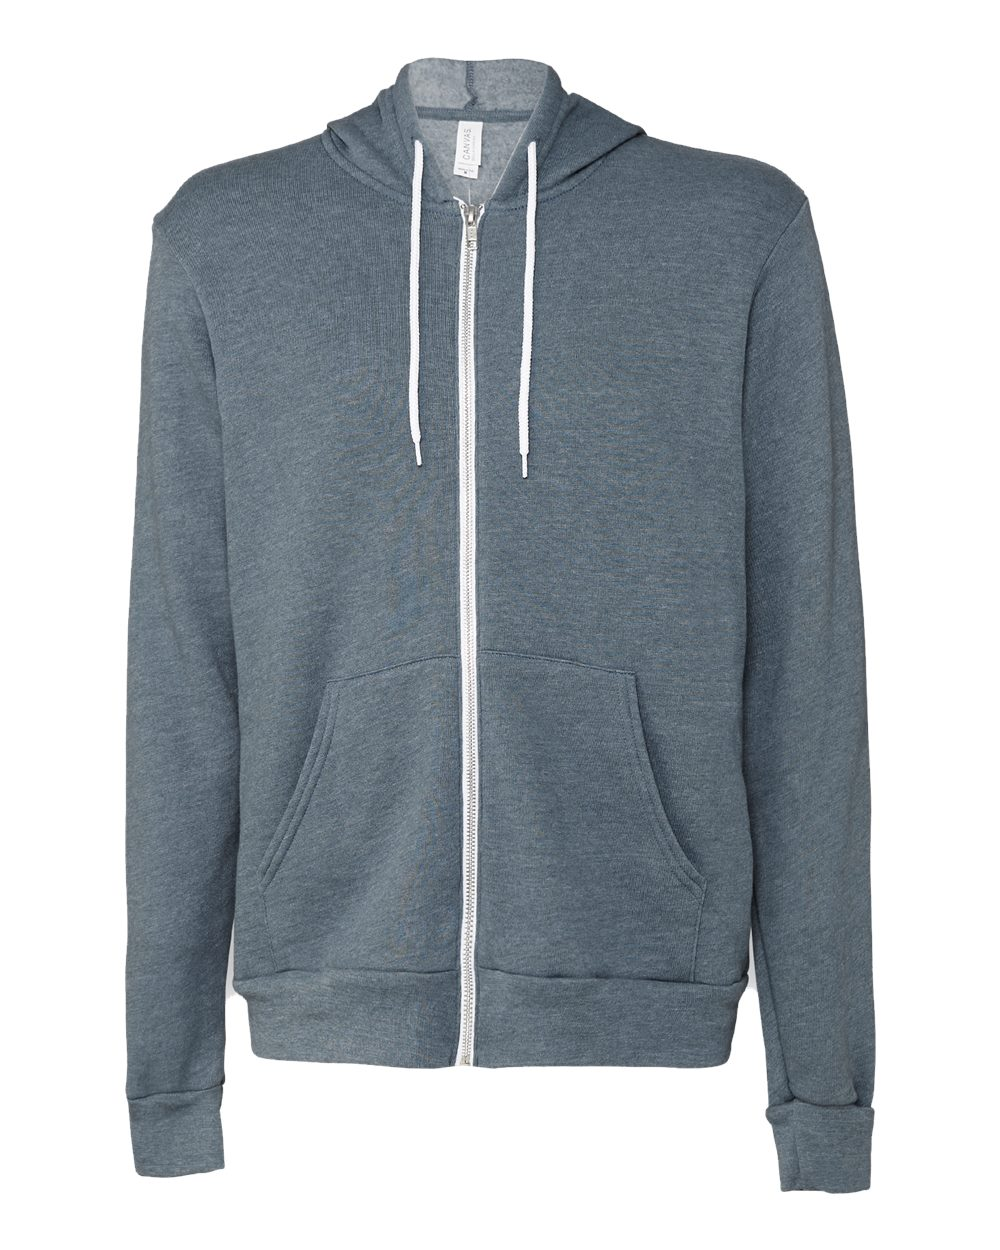 Bella-Canvas-Unisex-Full-Zip-Up-Hooded-Sweatshirt-Blank-Hoodie-3739-up-to-3XL thumbnail 54